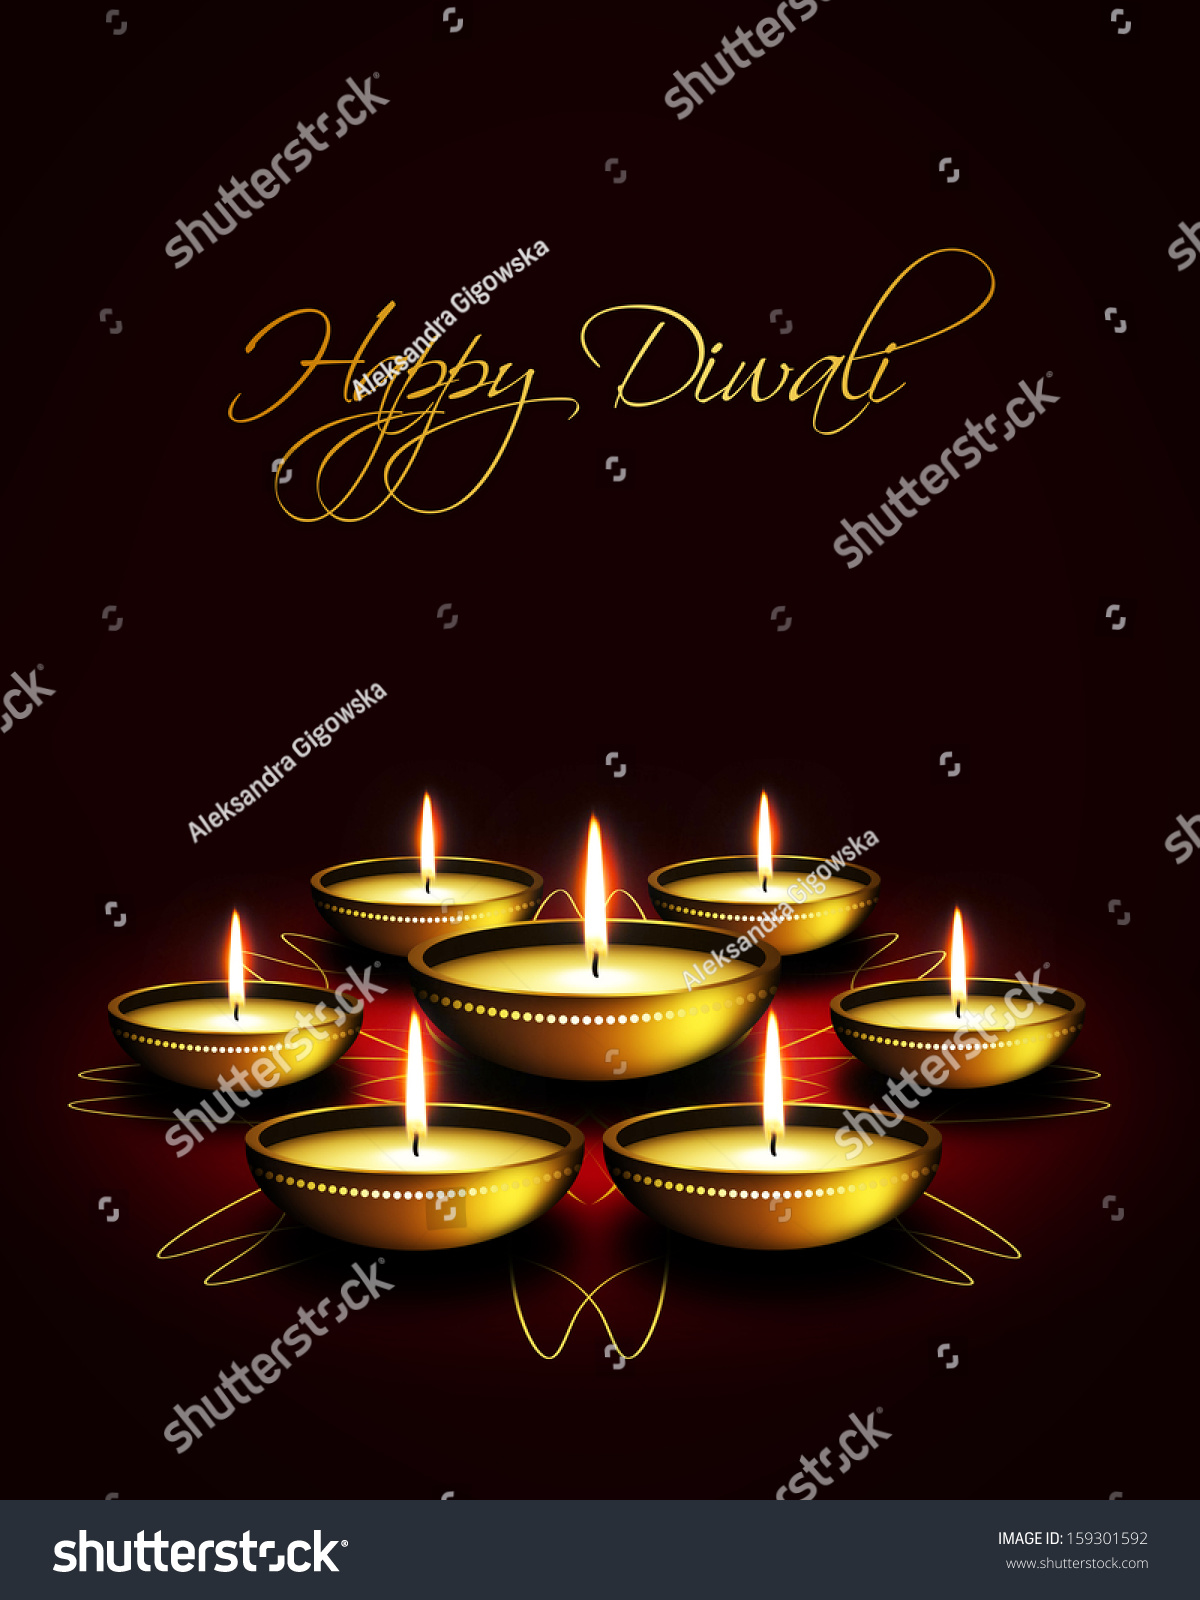 Oil Lamp Diwali Greetings Over Dark Stock Illustration 159301592